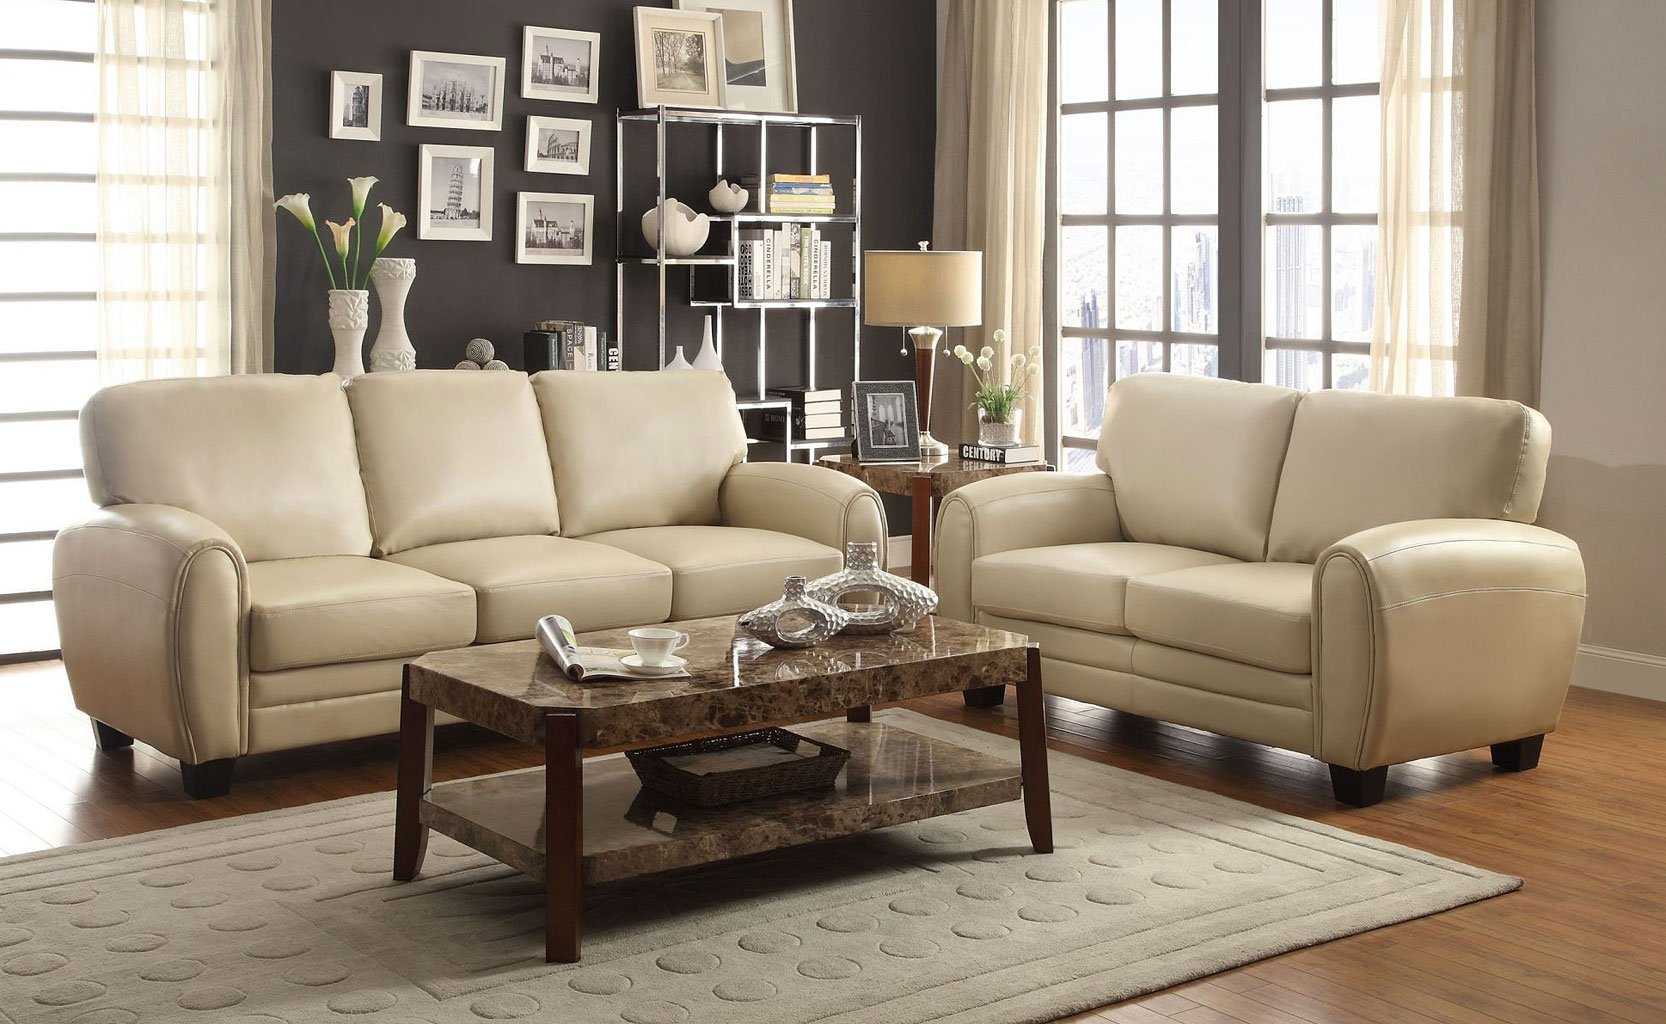 Attirant Rubin Living Room Set (Taupe)